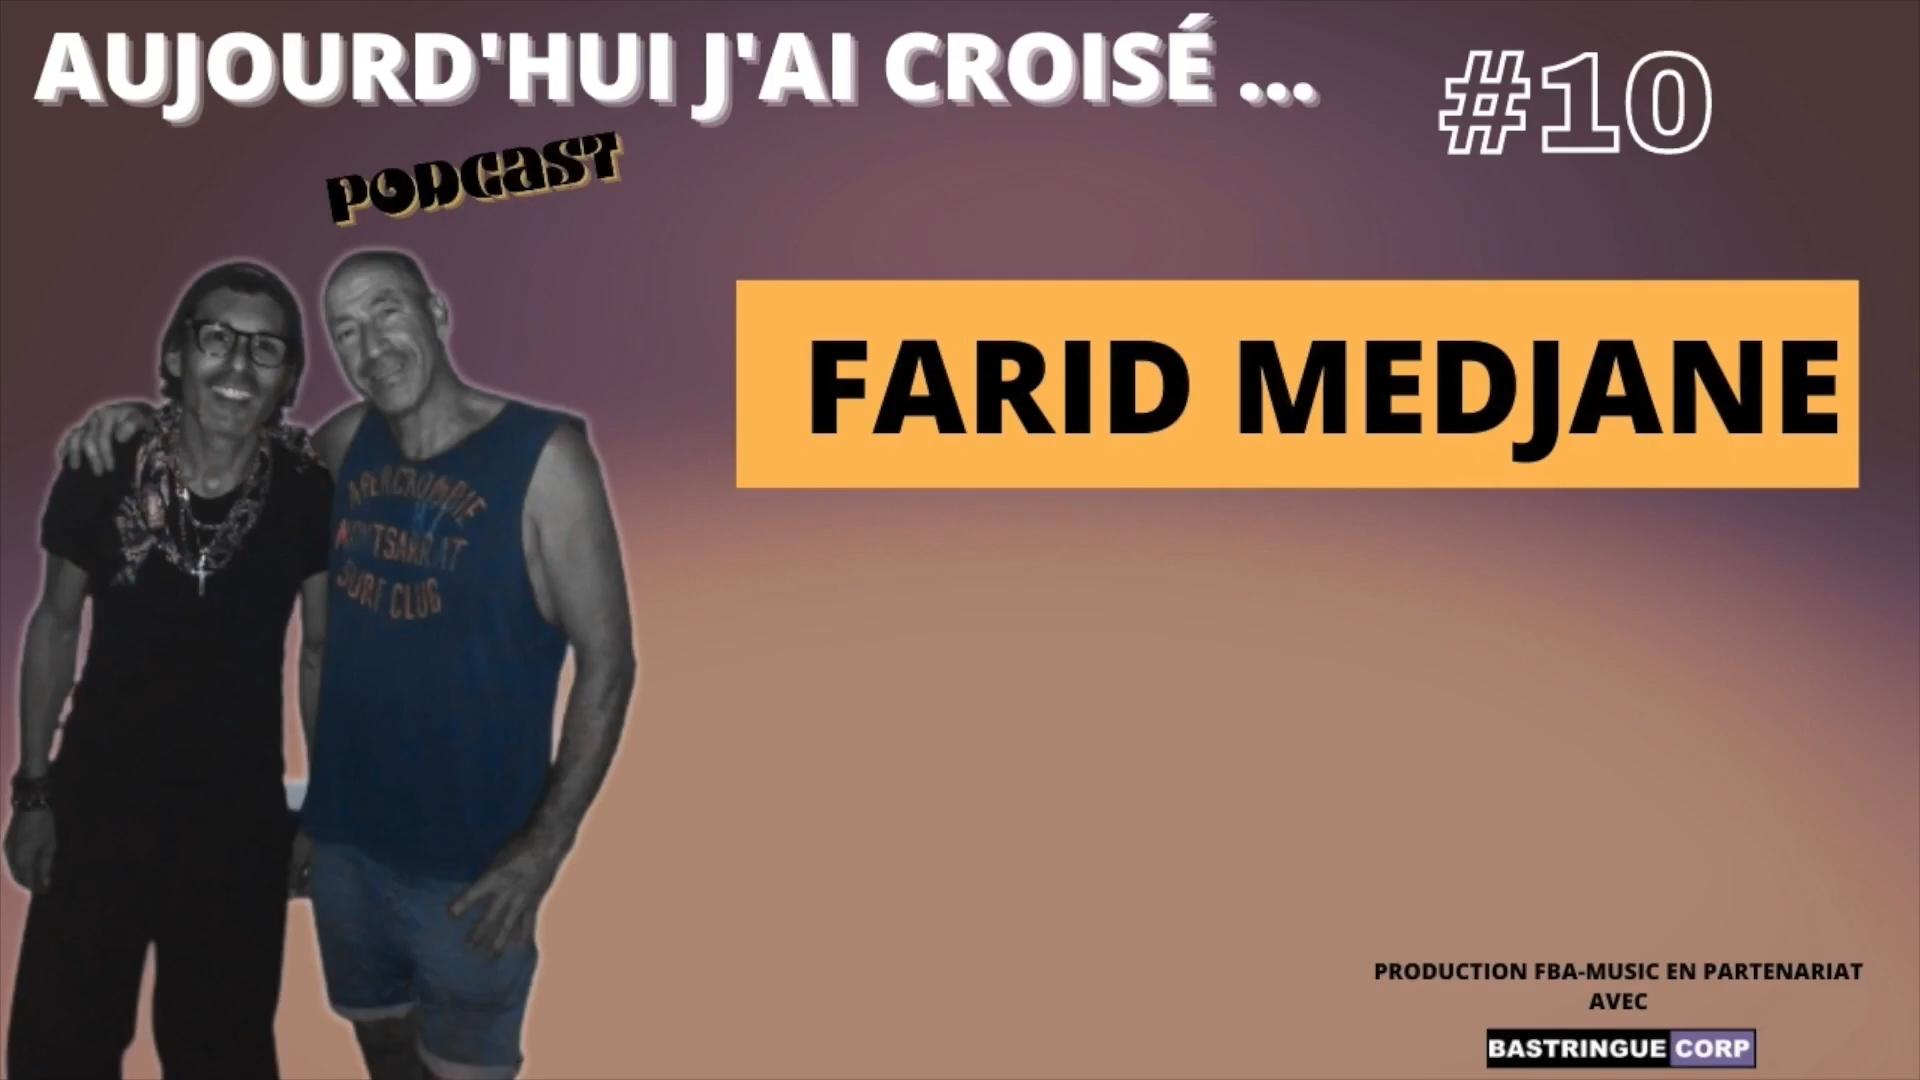 Aujourd'hui, j'ai croisé : Farid Medjane